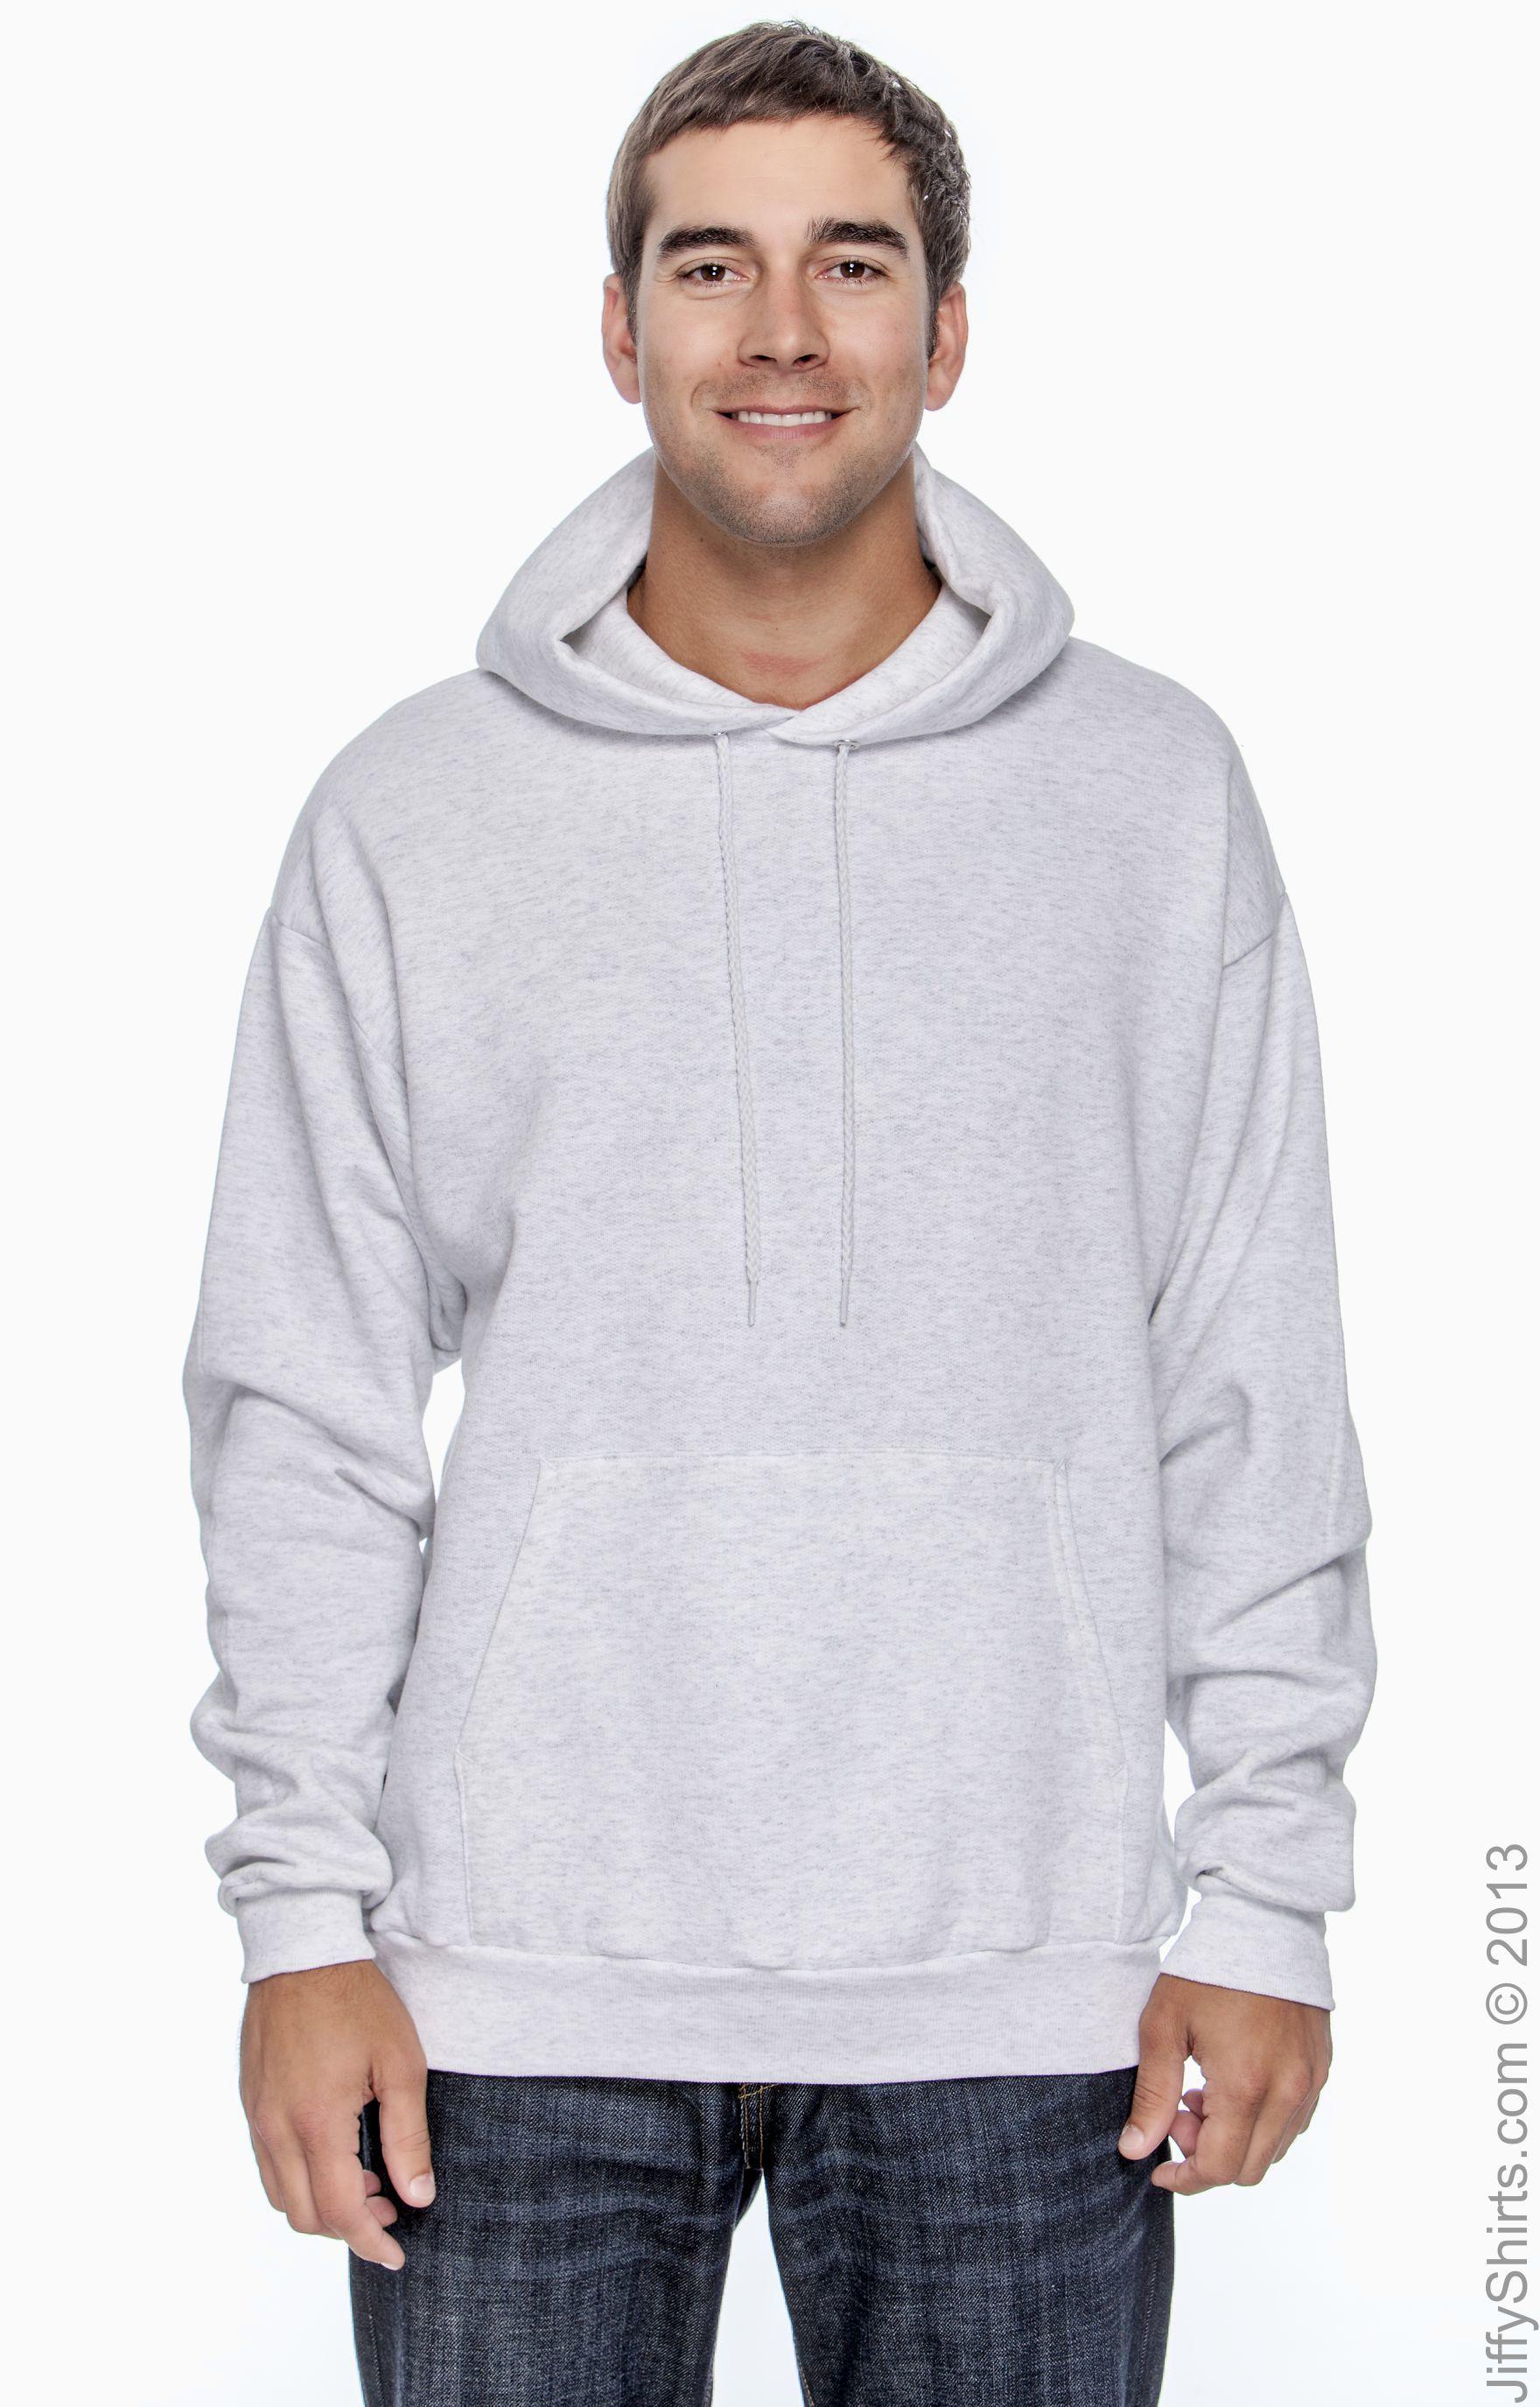 Hanes P170 Mens EcoSmart Hooded Sweatshirt 2XL 1 Light Blue 1 Light Steel